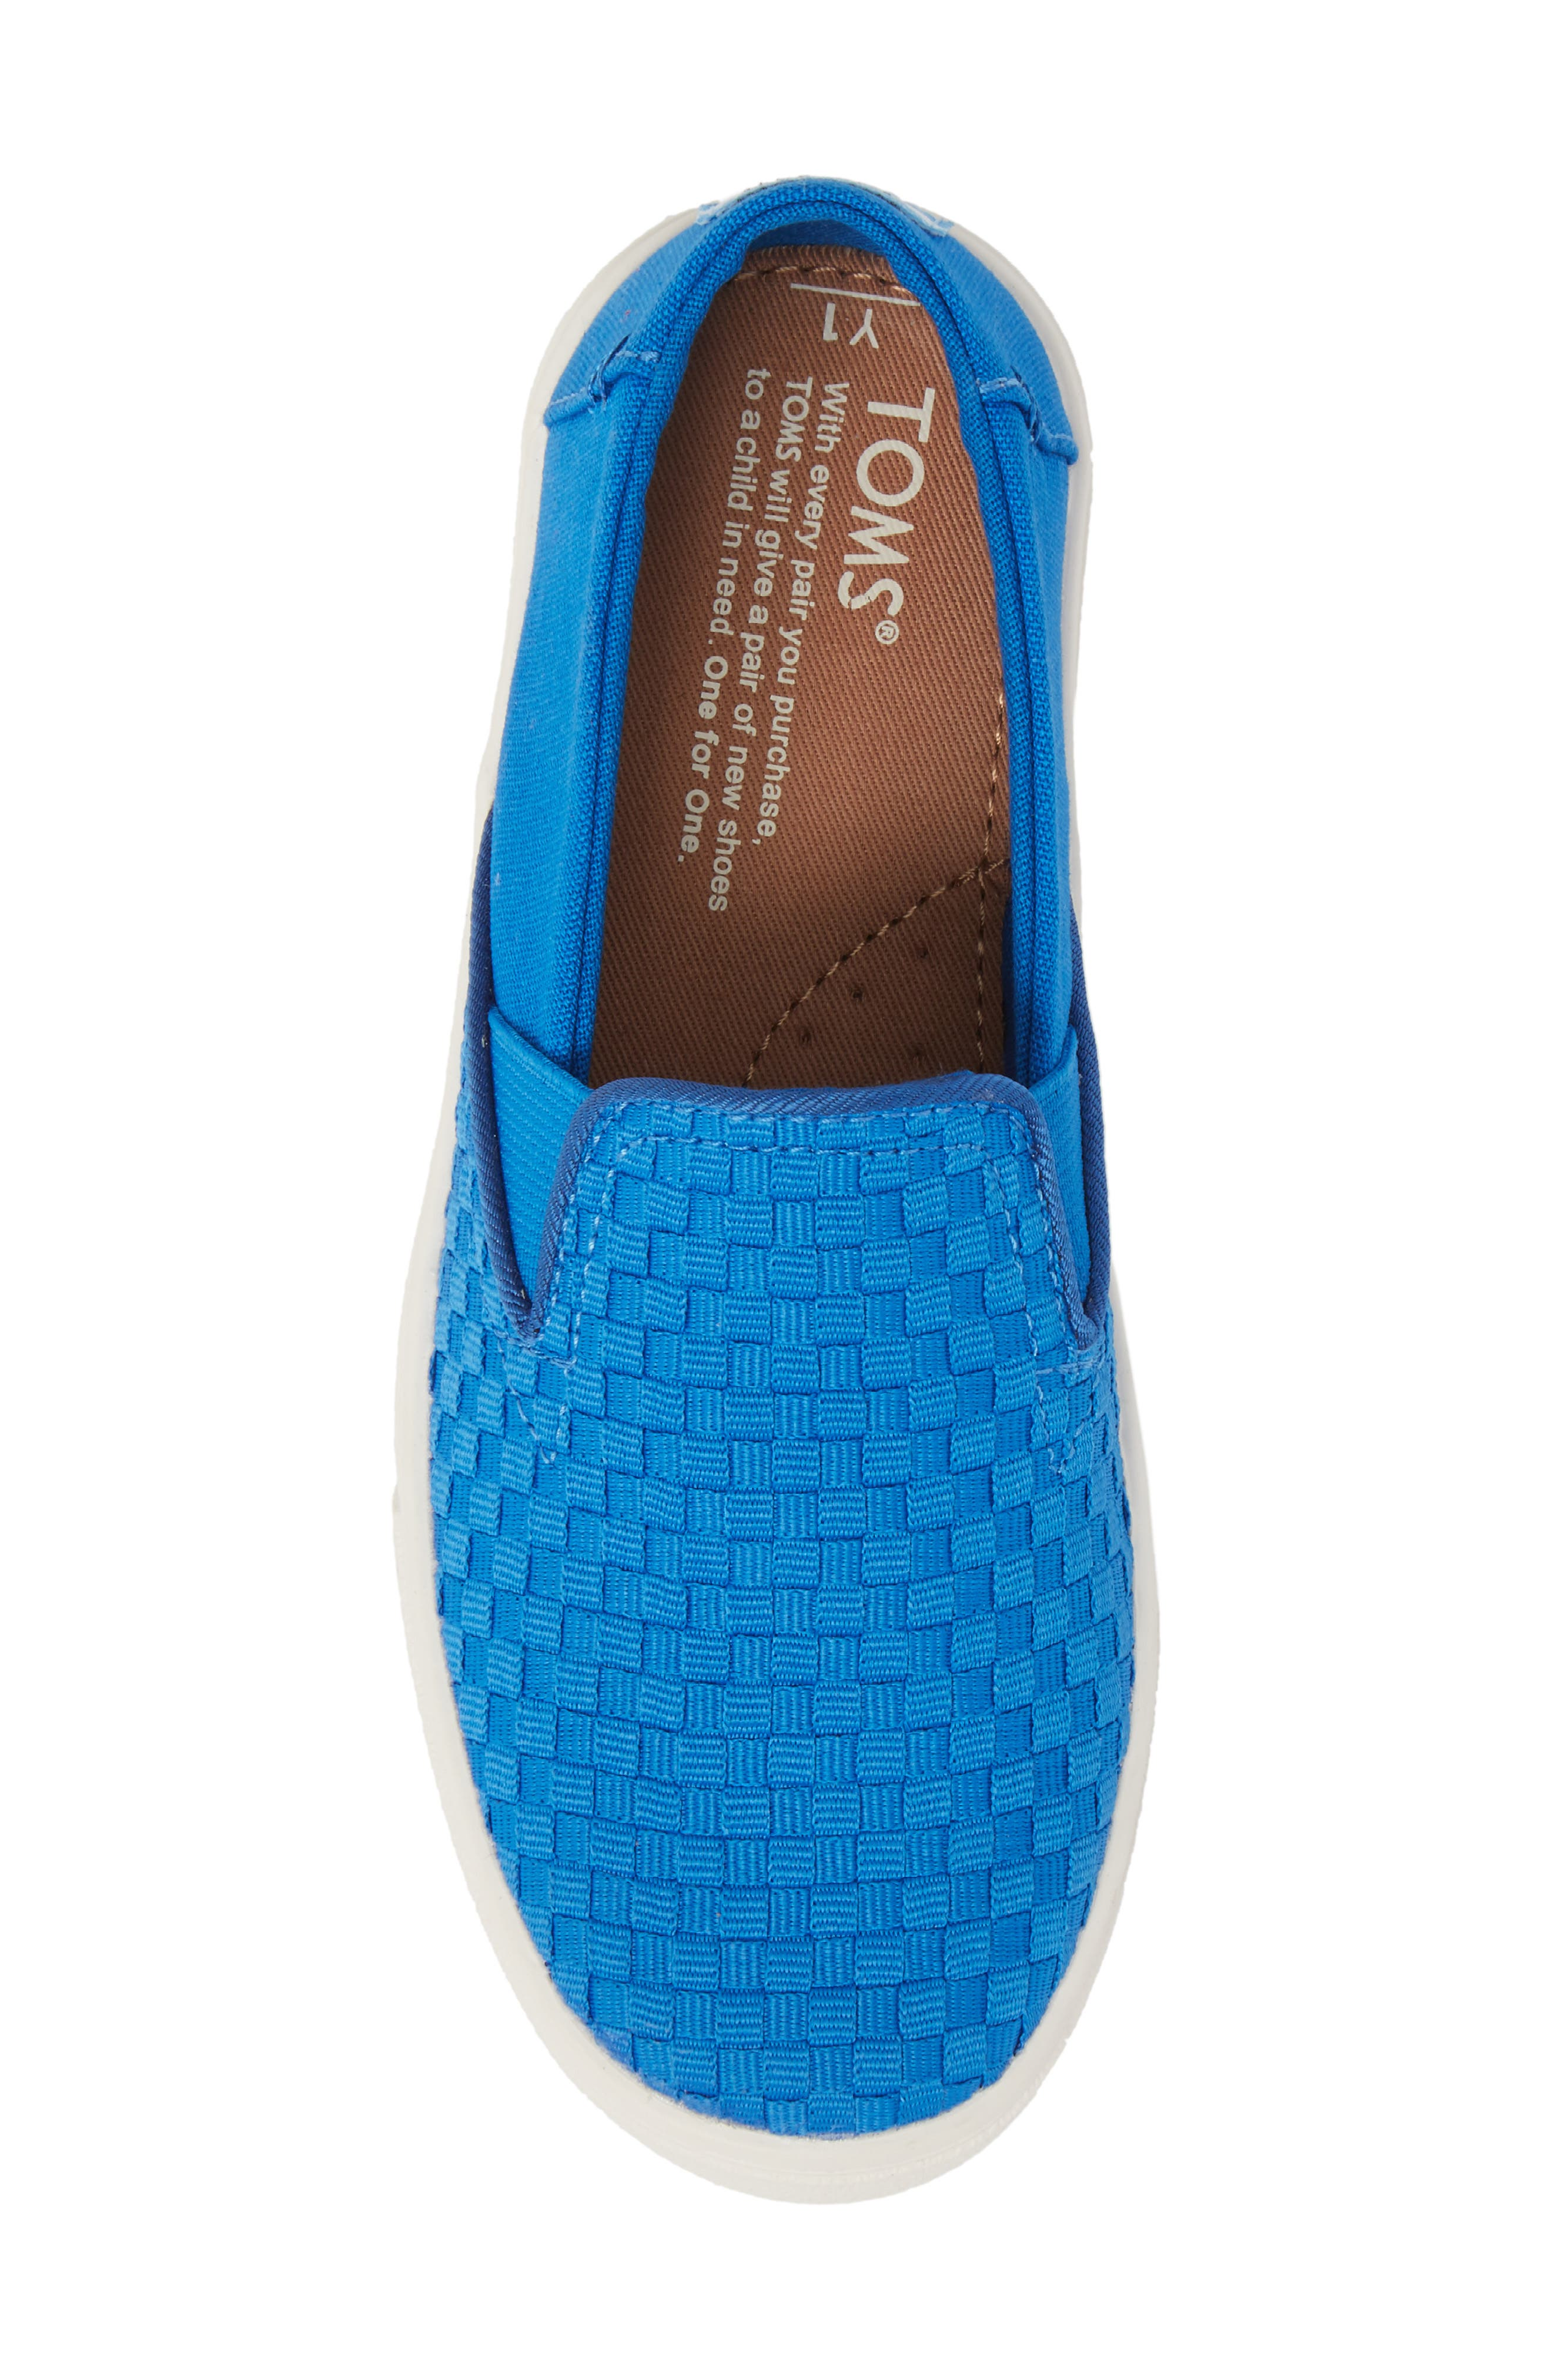 Luca Slip-On Sneaker,                             Alternate thumbnail 5, color,                             Imperial Blue Basketweave